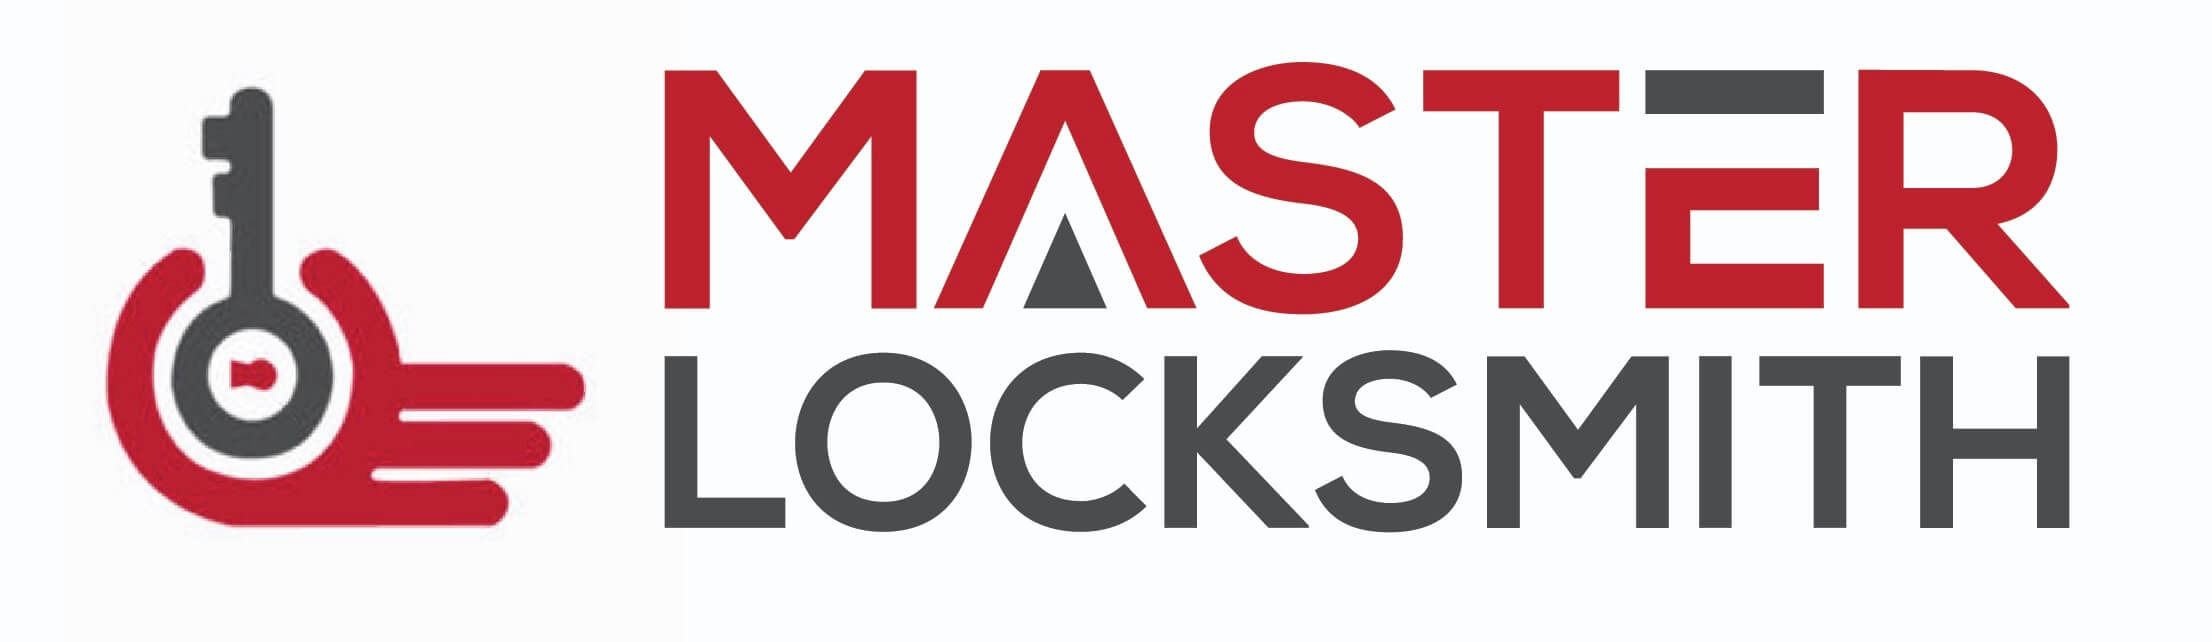 Master Locksmith Is The St. Louis Locksmith Near Me